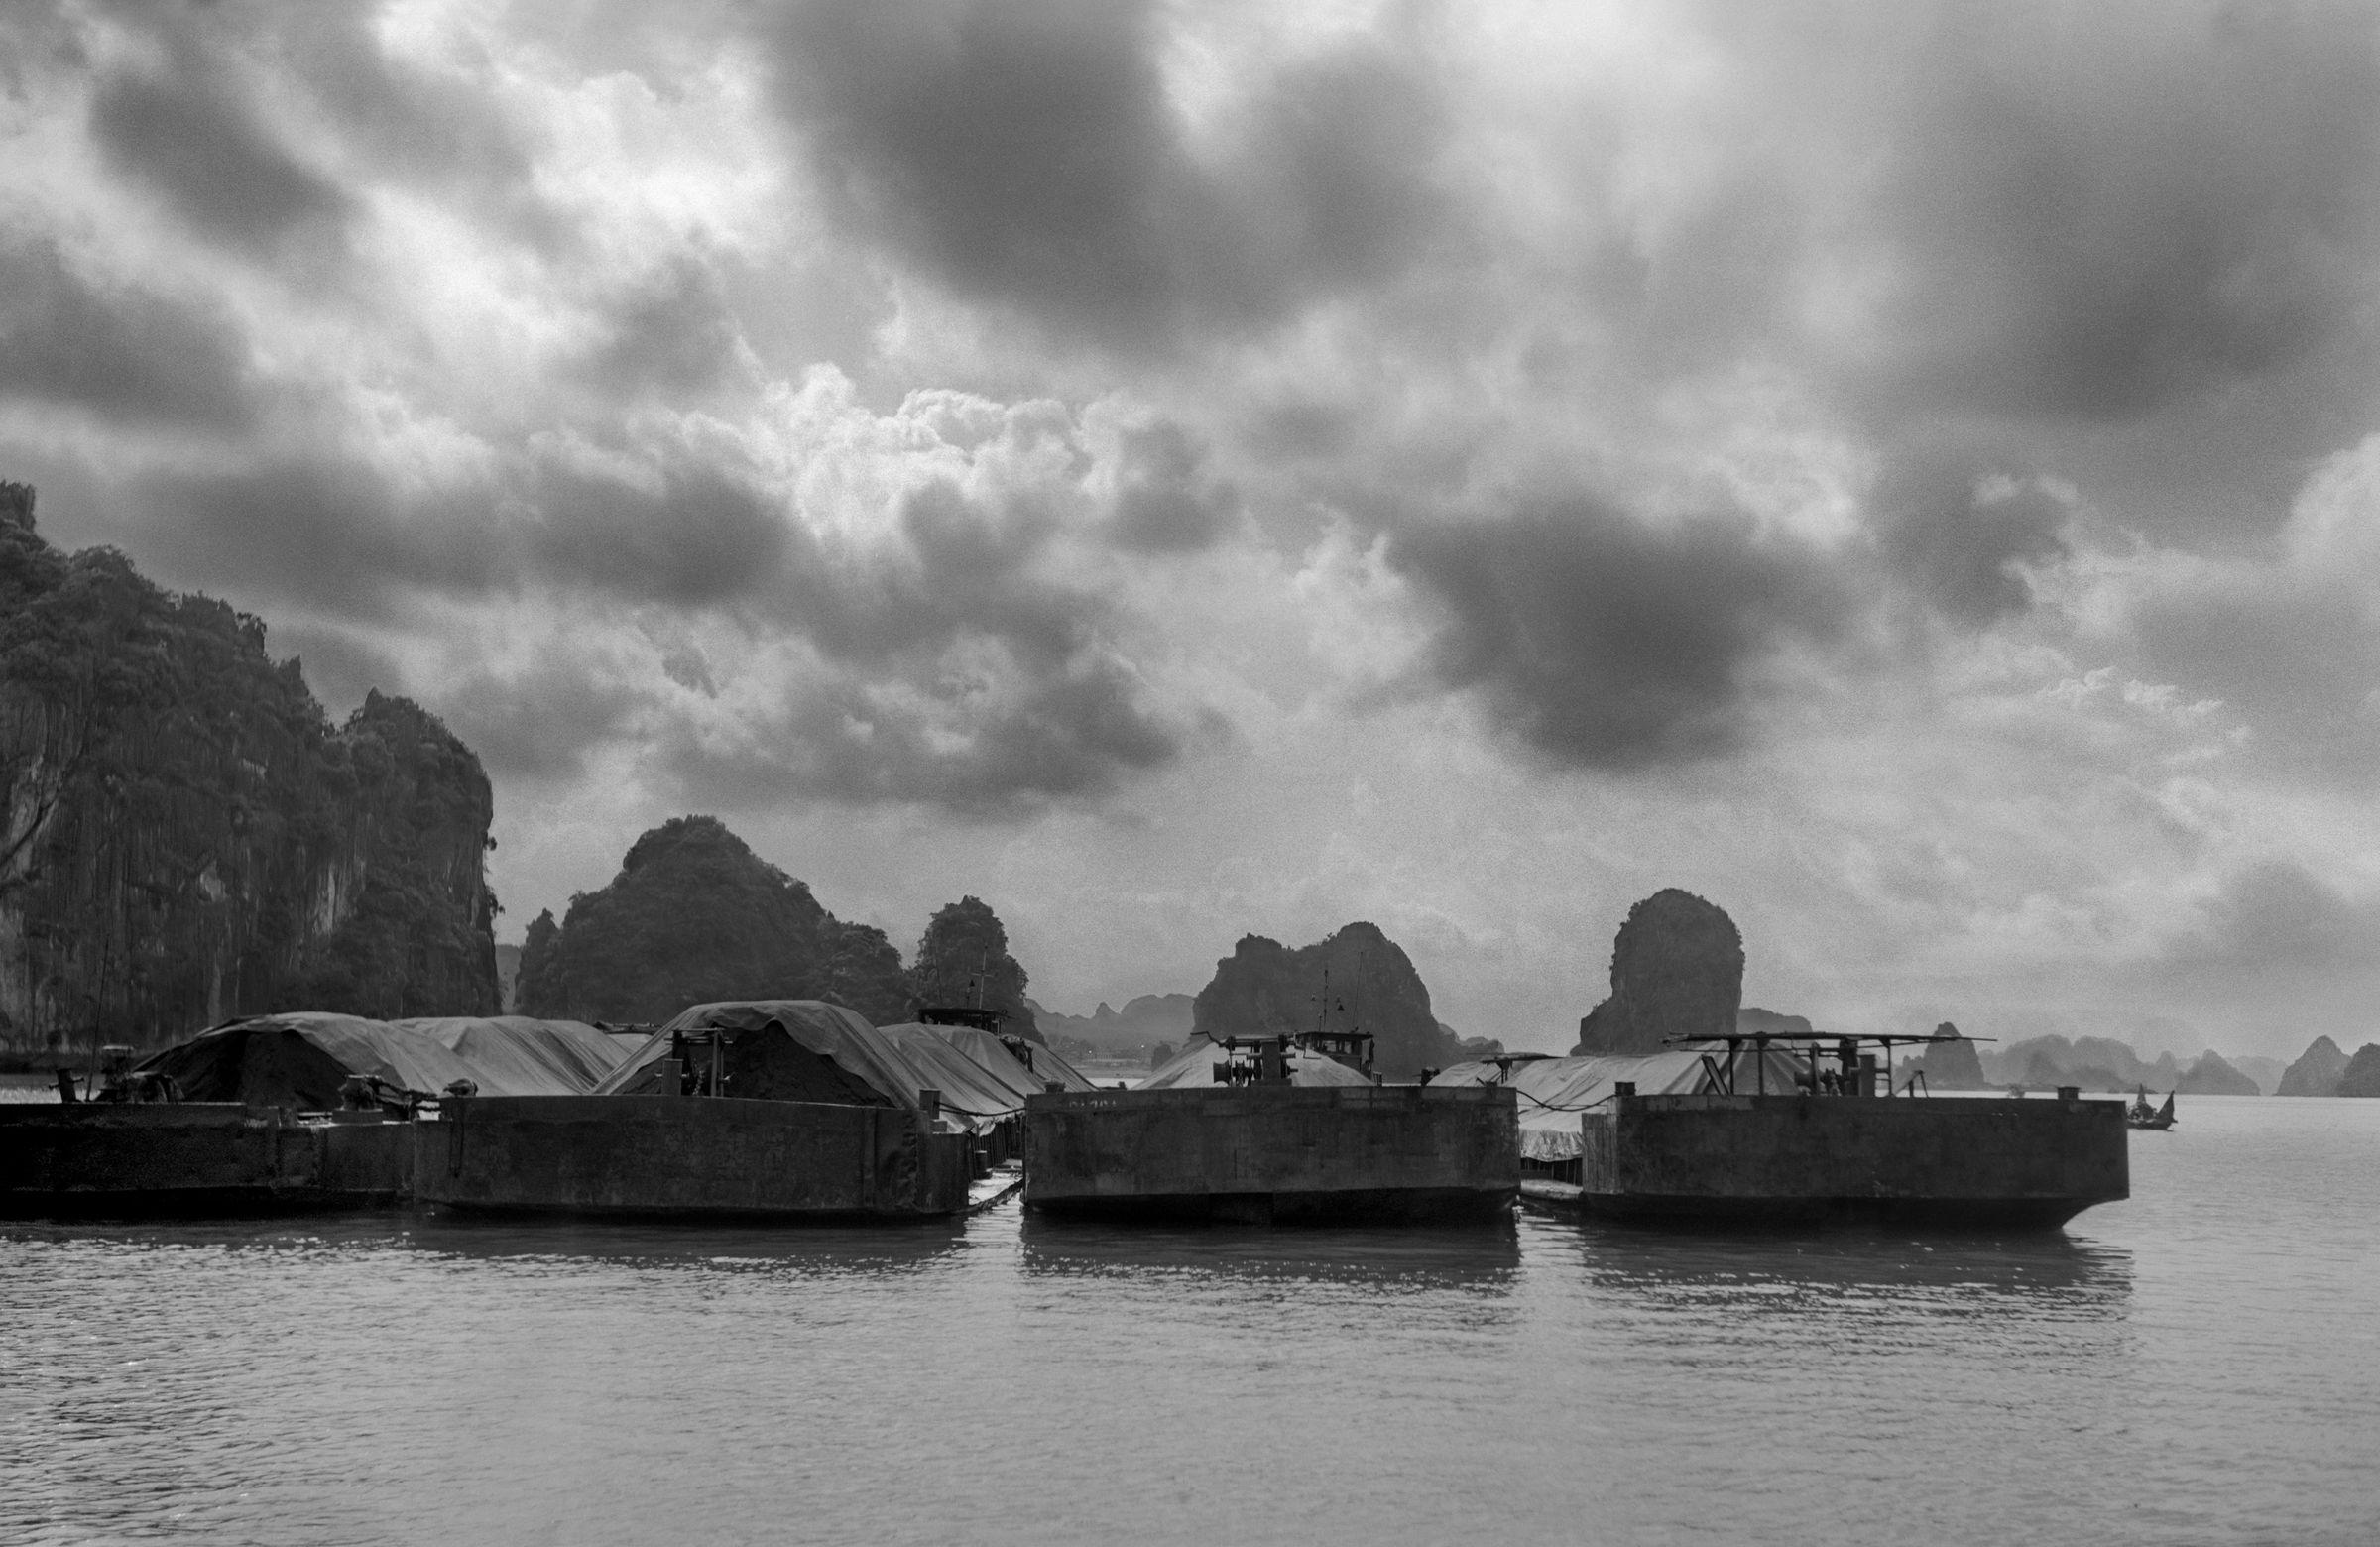 Coal Barges, Halong Bay